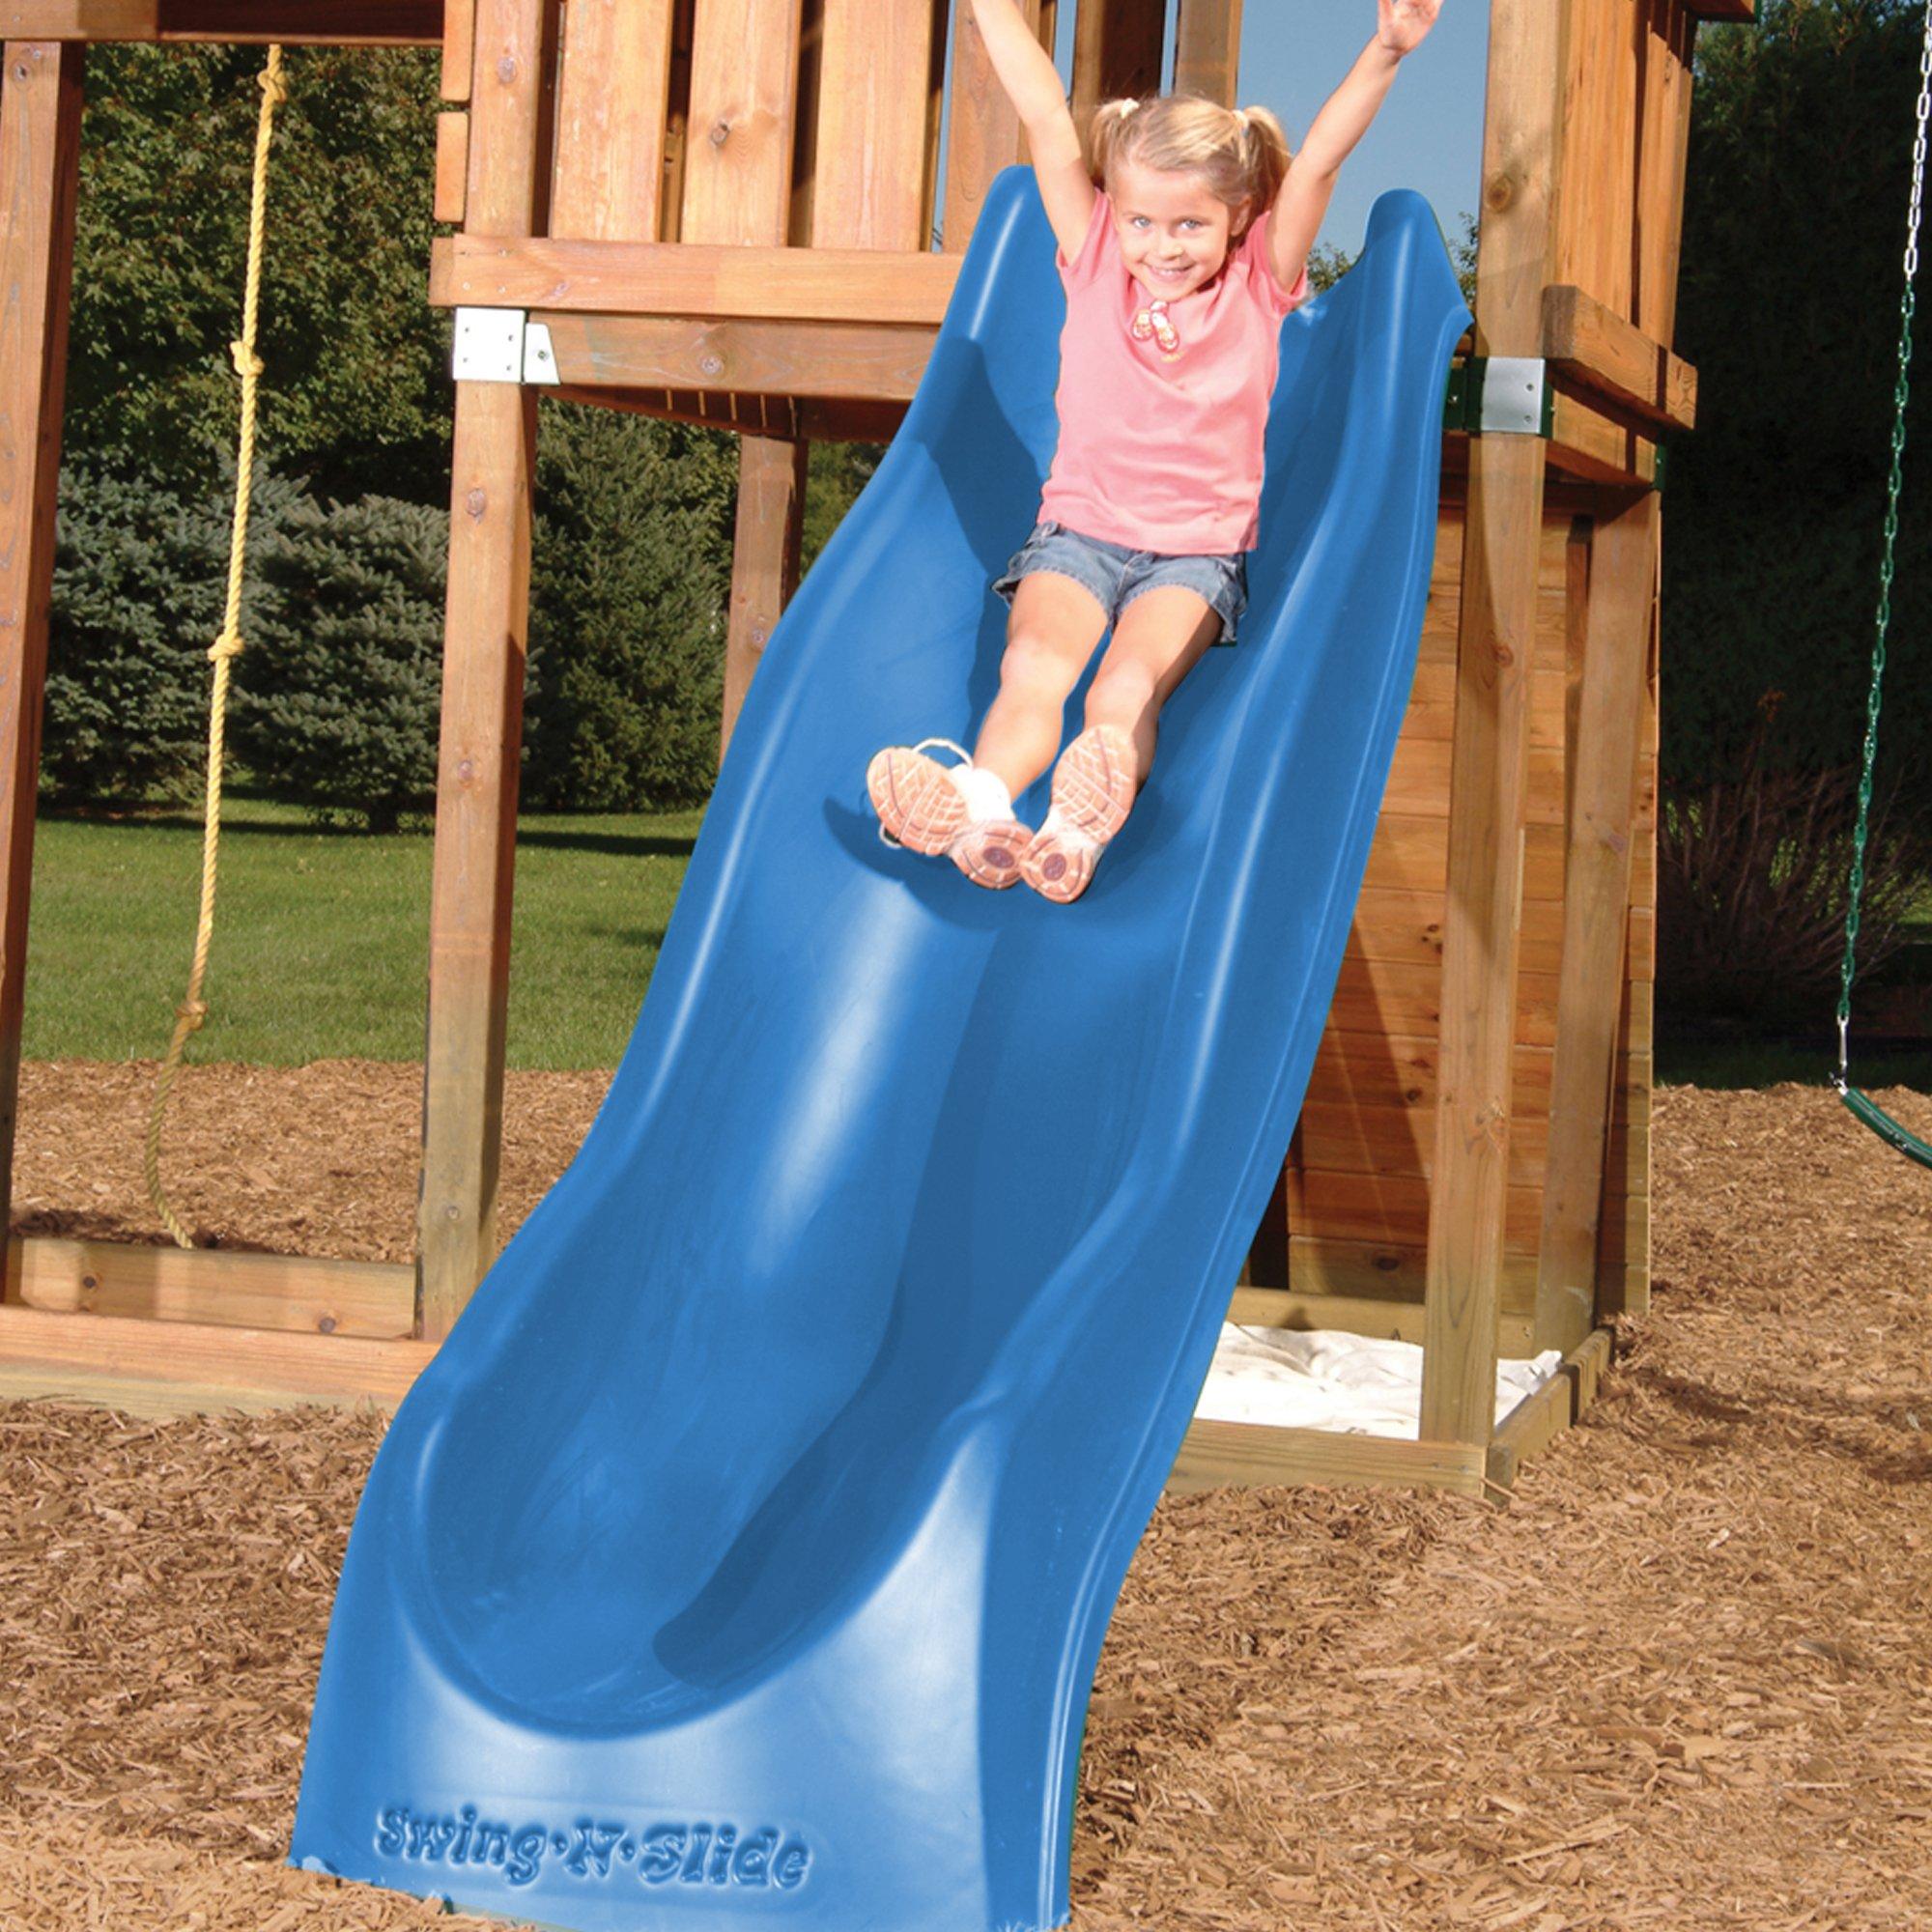 Swing-N-Slide NE 3054 Speedwave Slide Plastic Slide for 4' Decks with, Blue by Swing-N-Slide (Image #3)